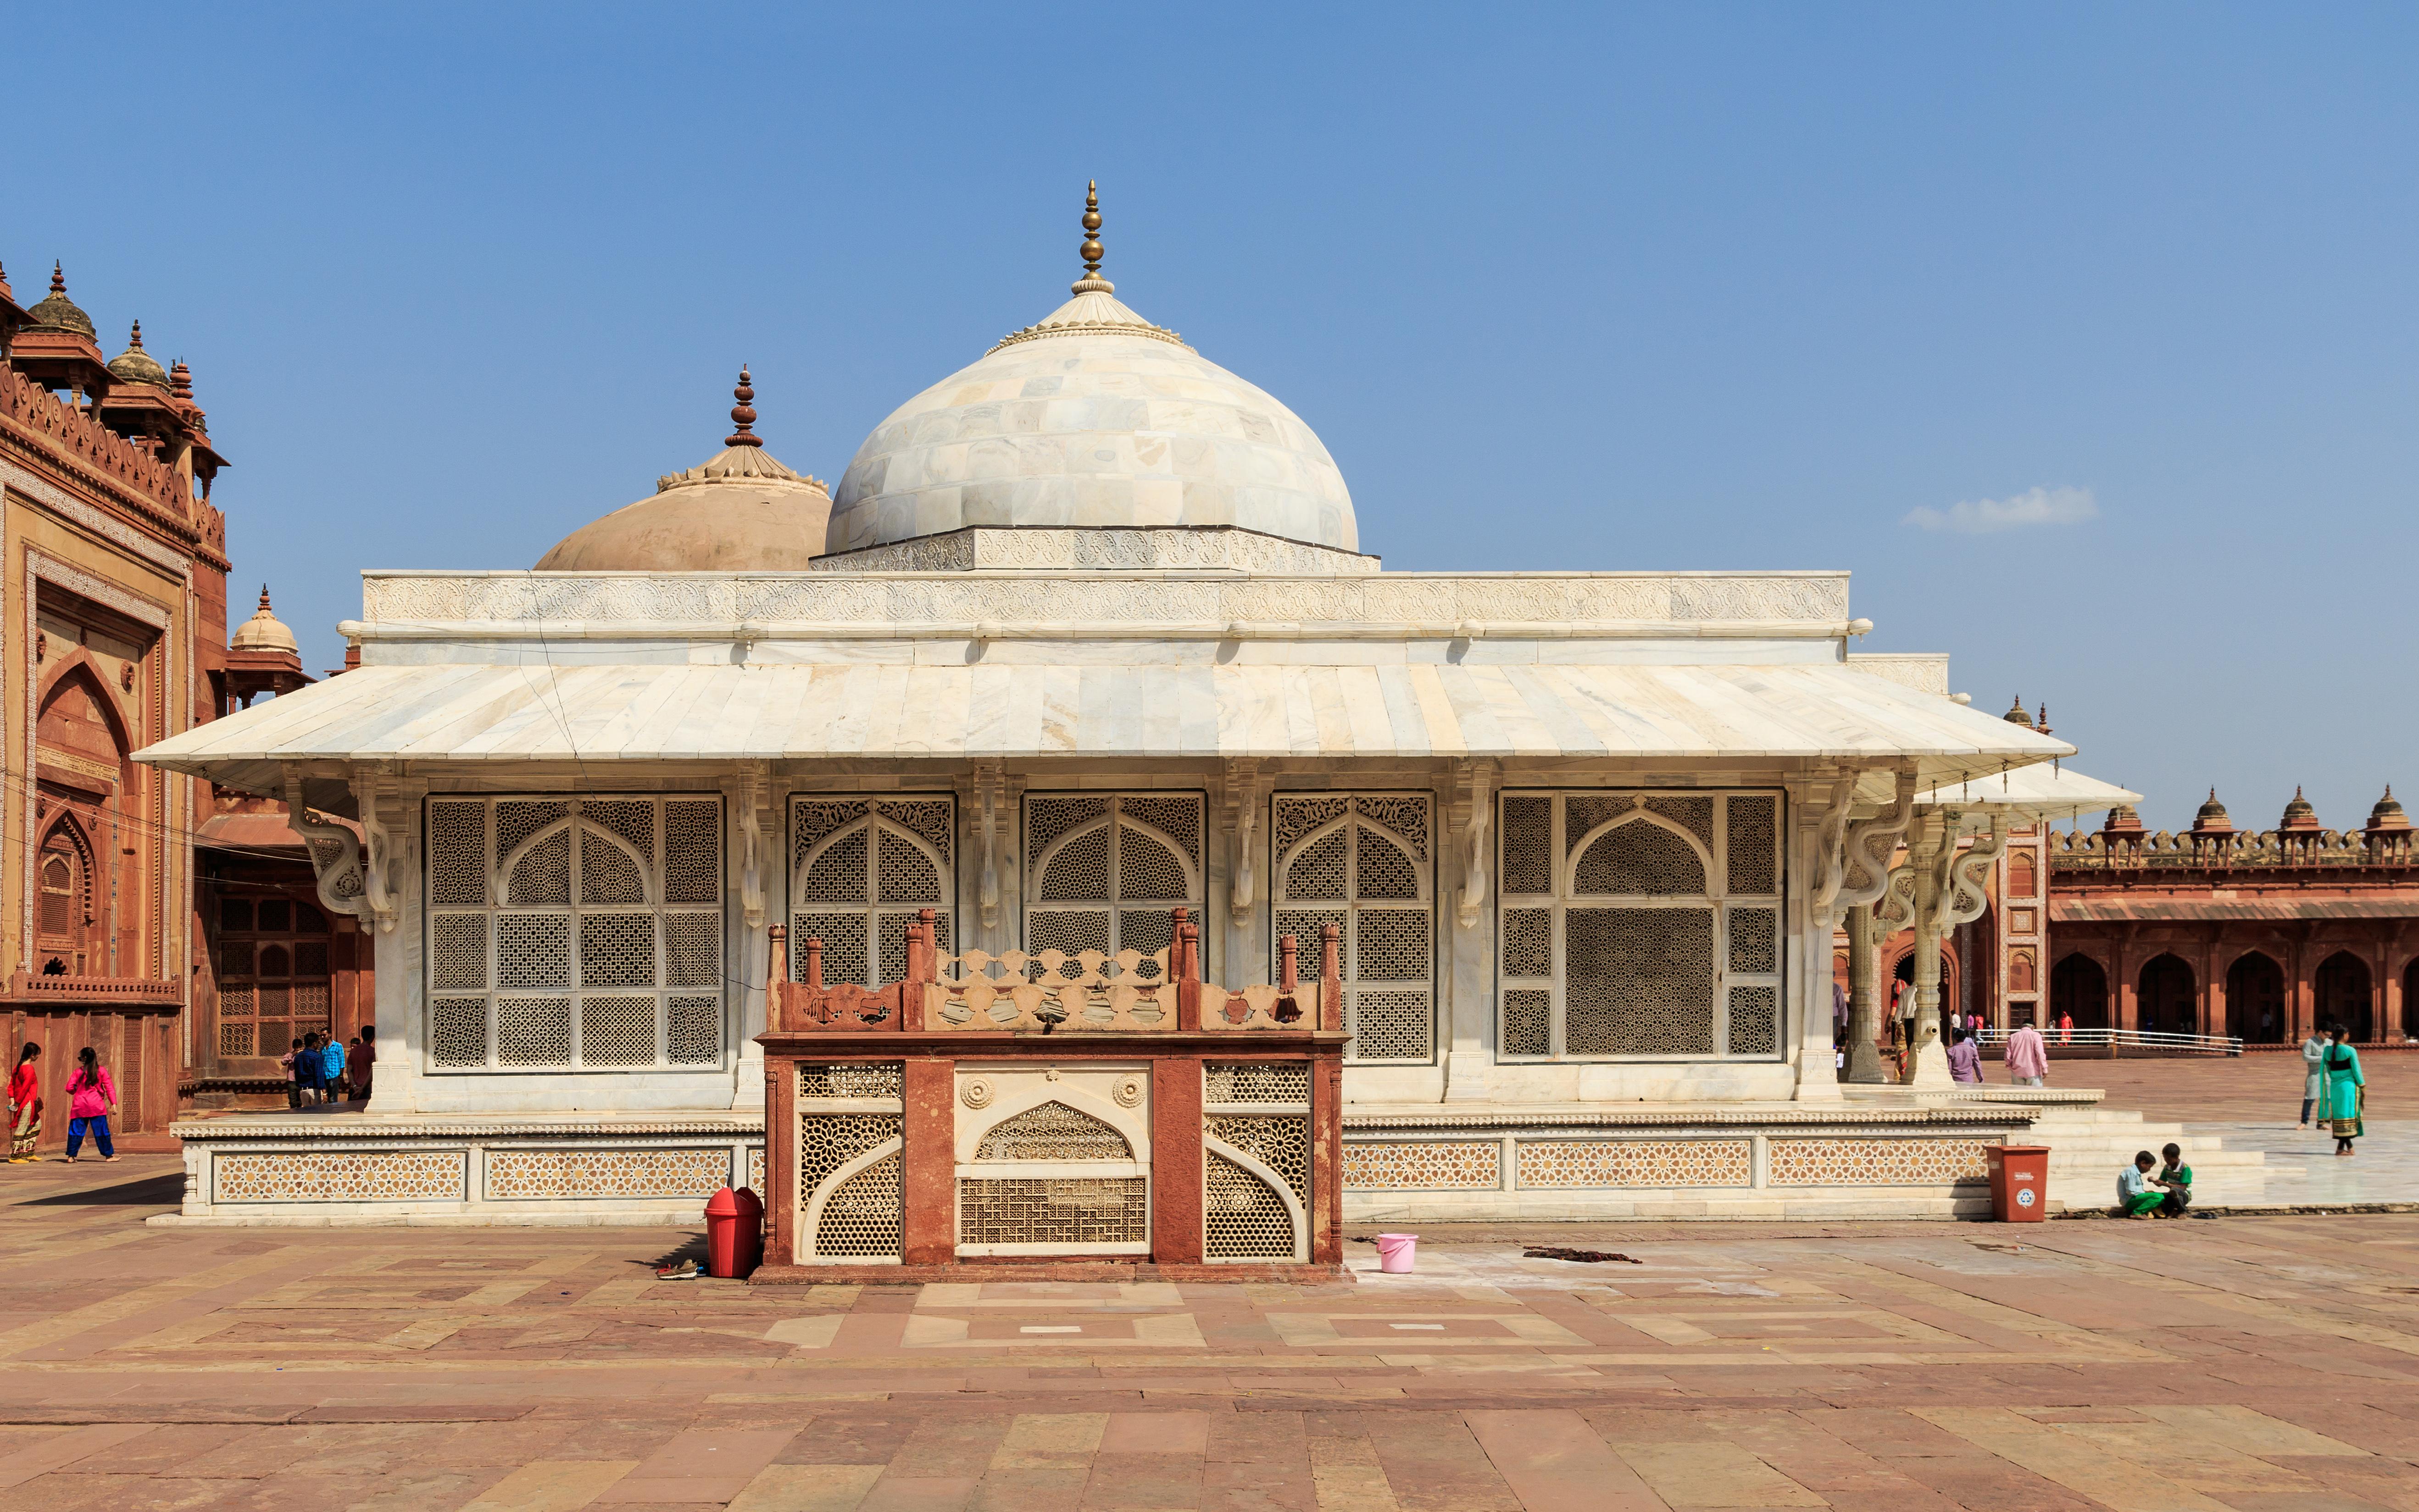 Tomb of Salim Chishti in Fatehpur Sikri, Uttar Pradesh, India.